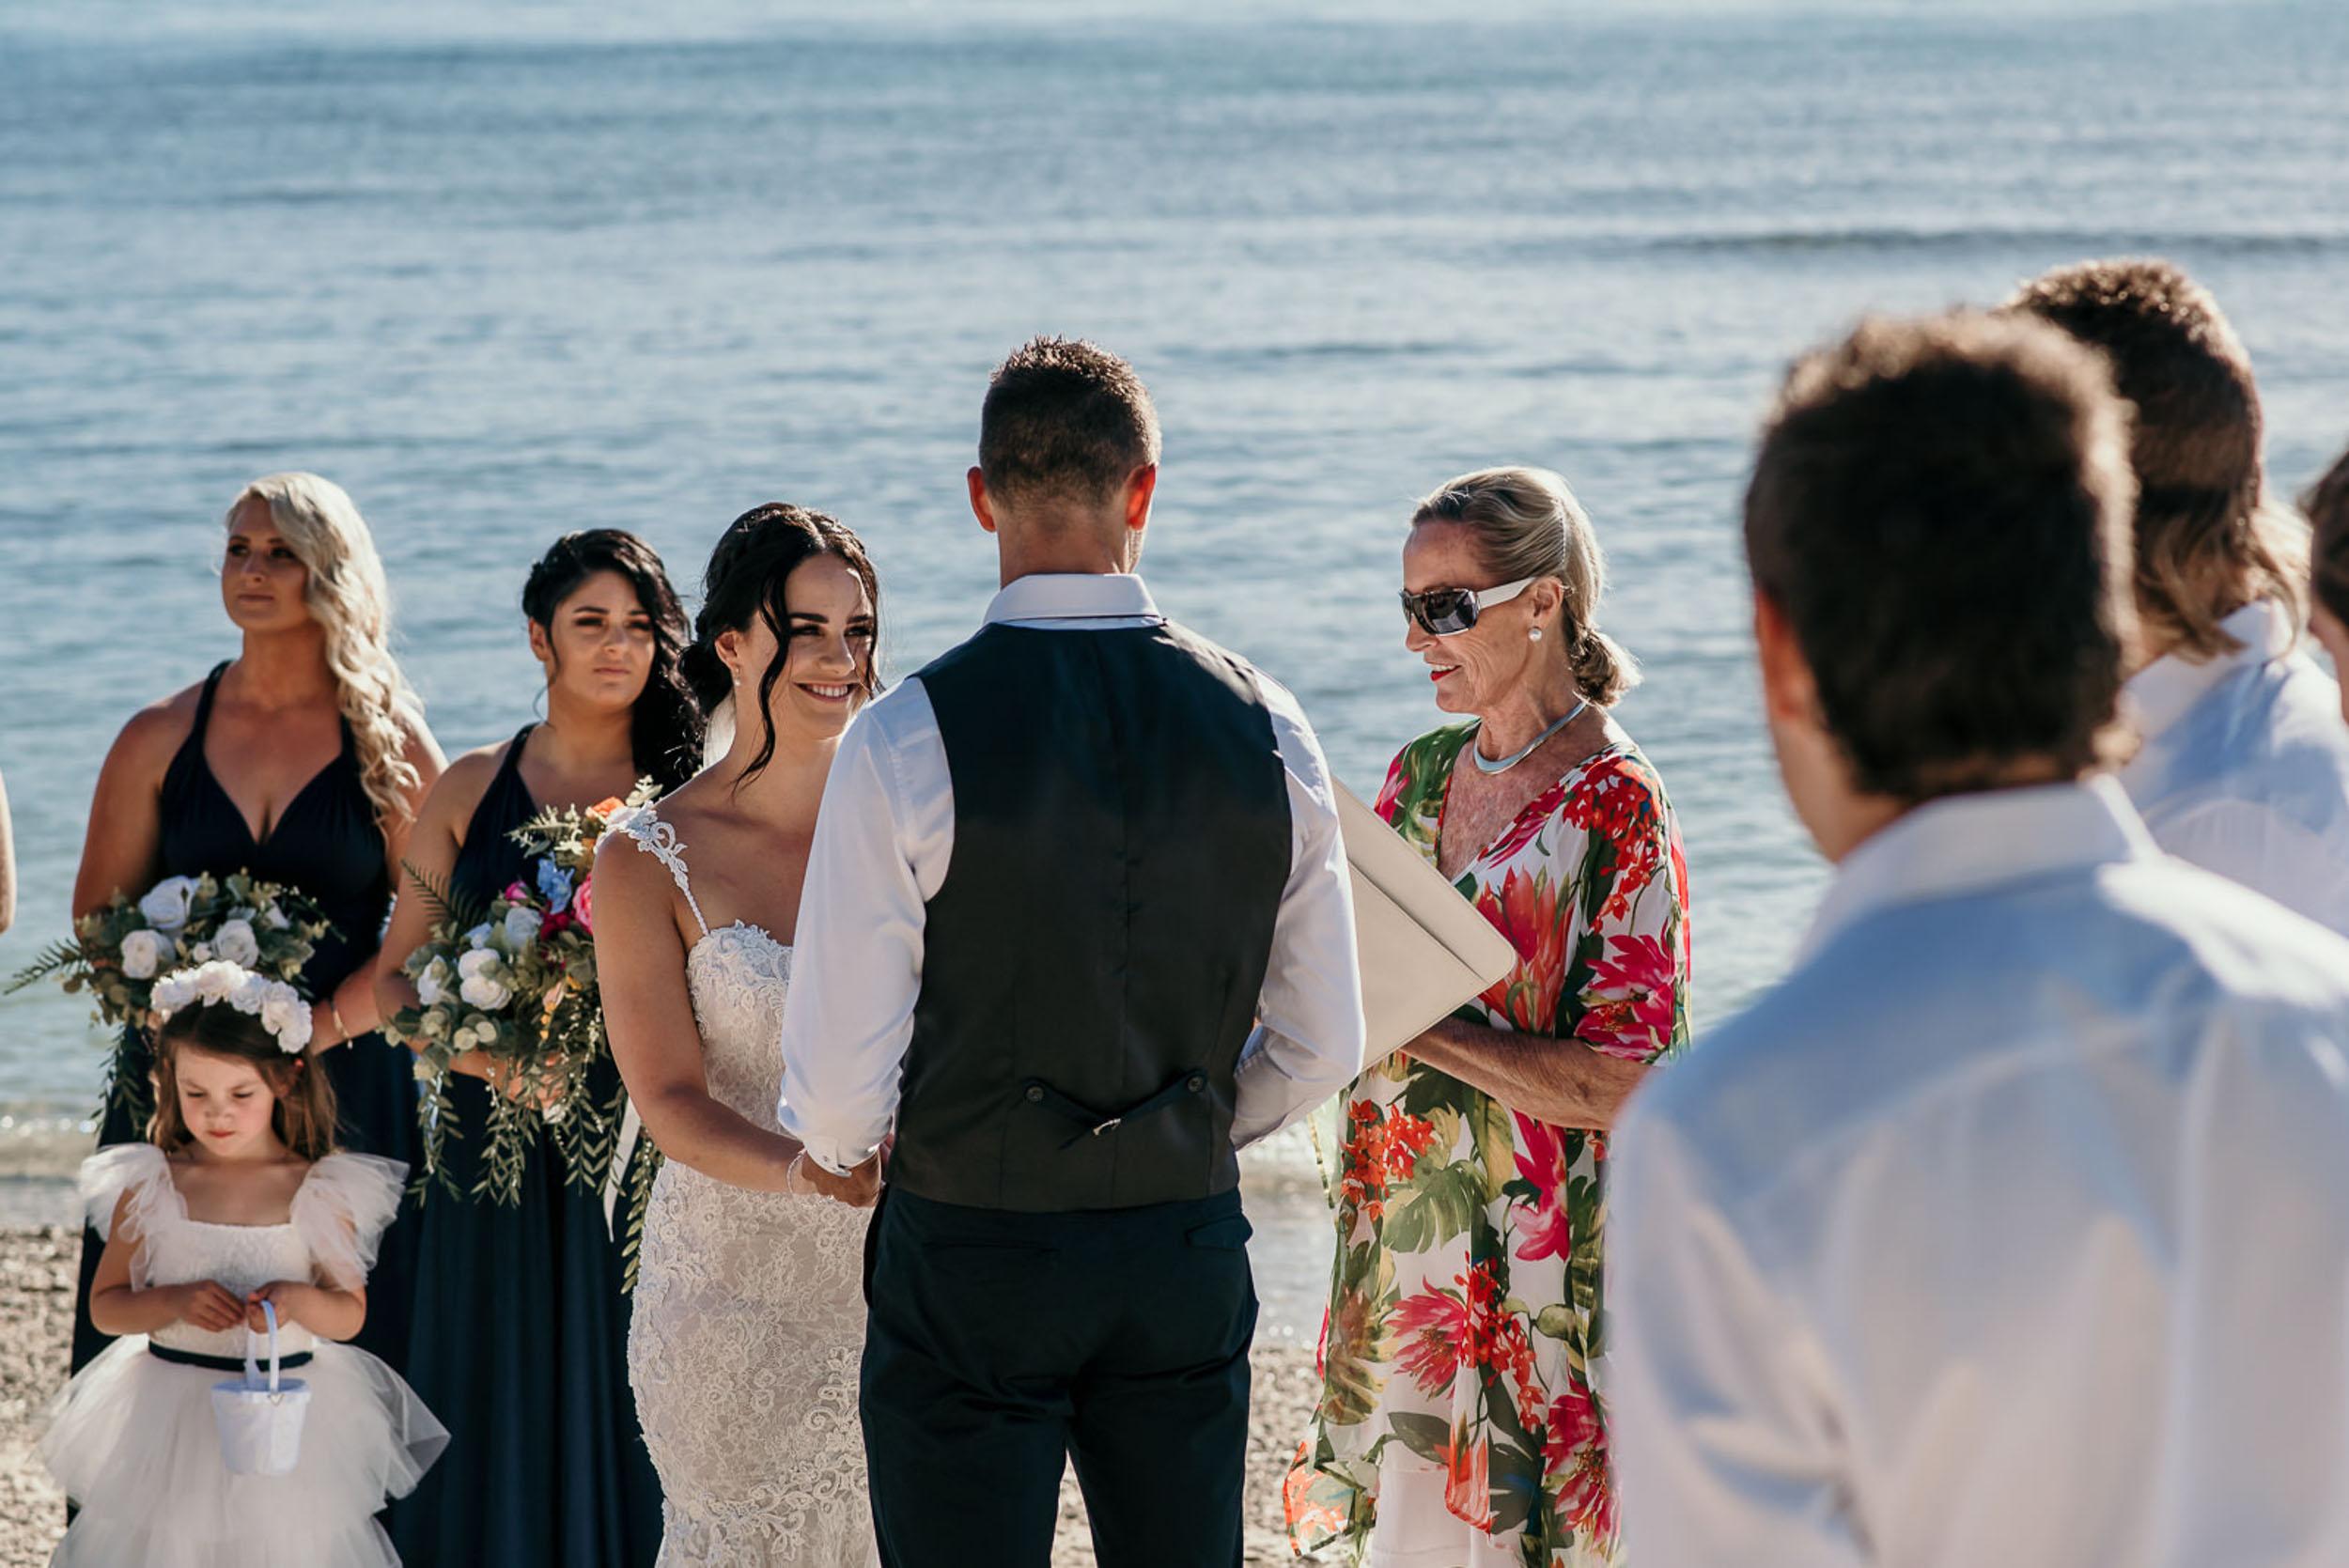 The Raw Photographer - Cairns Wedding Photographer - Fitzroy Island - Destination Wedding - Bride Dress - Groom Portrait - Queensland-21.jpg